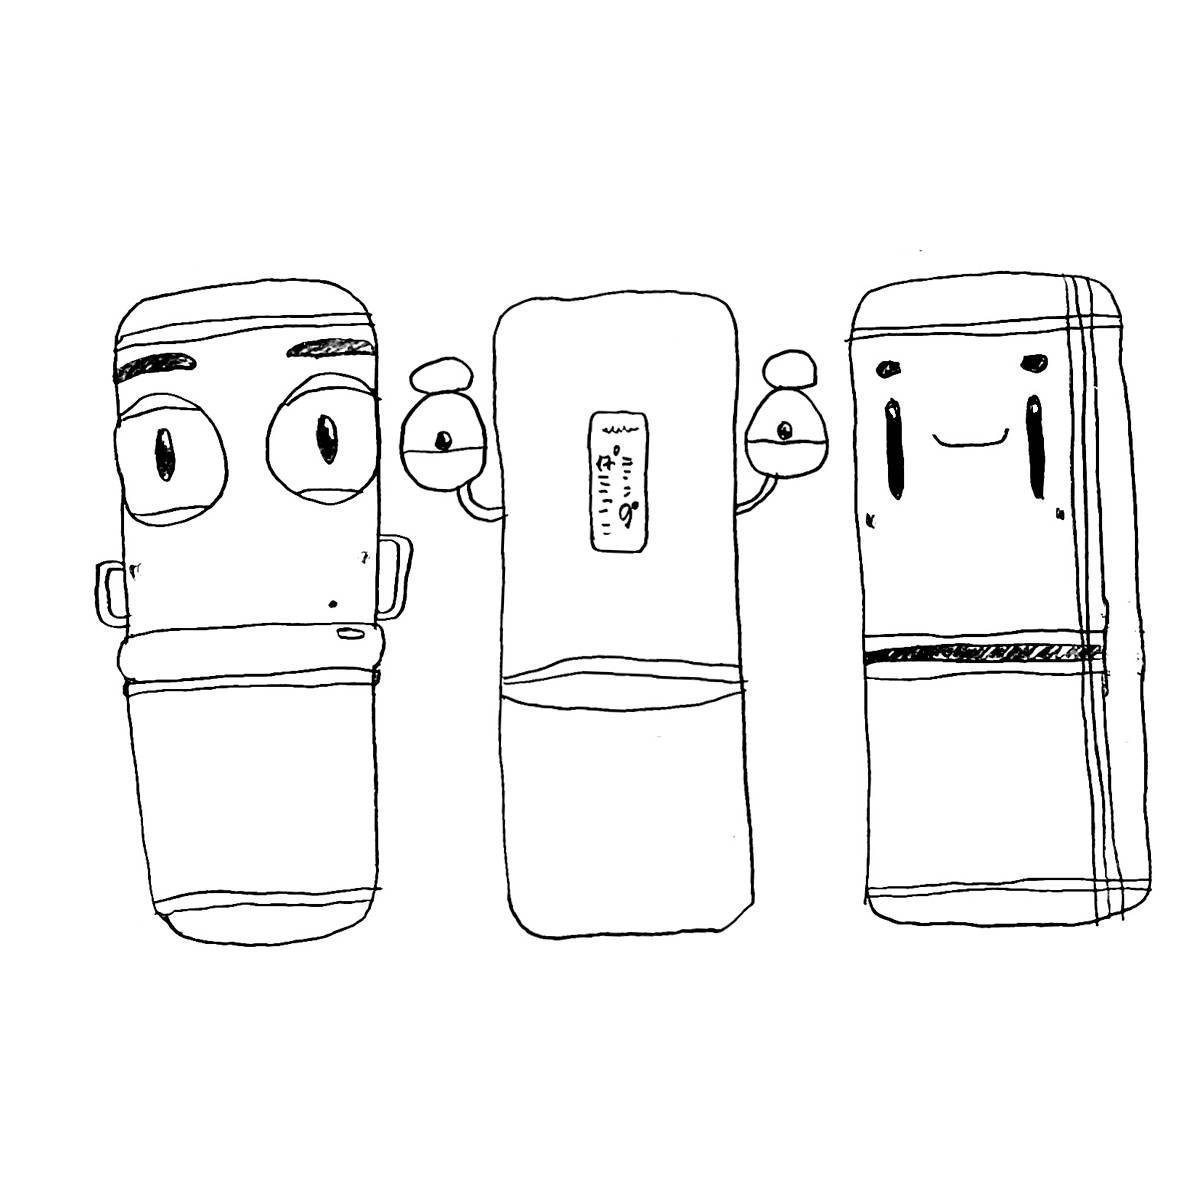 fridge03.jpg